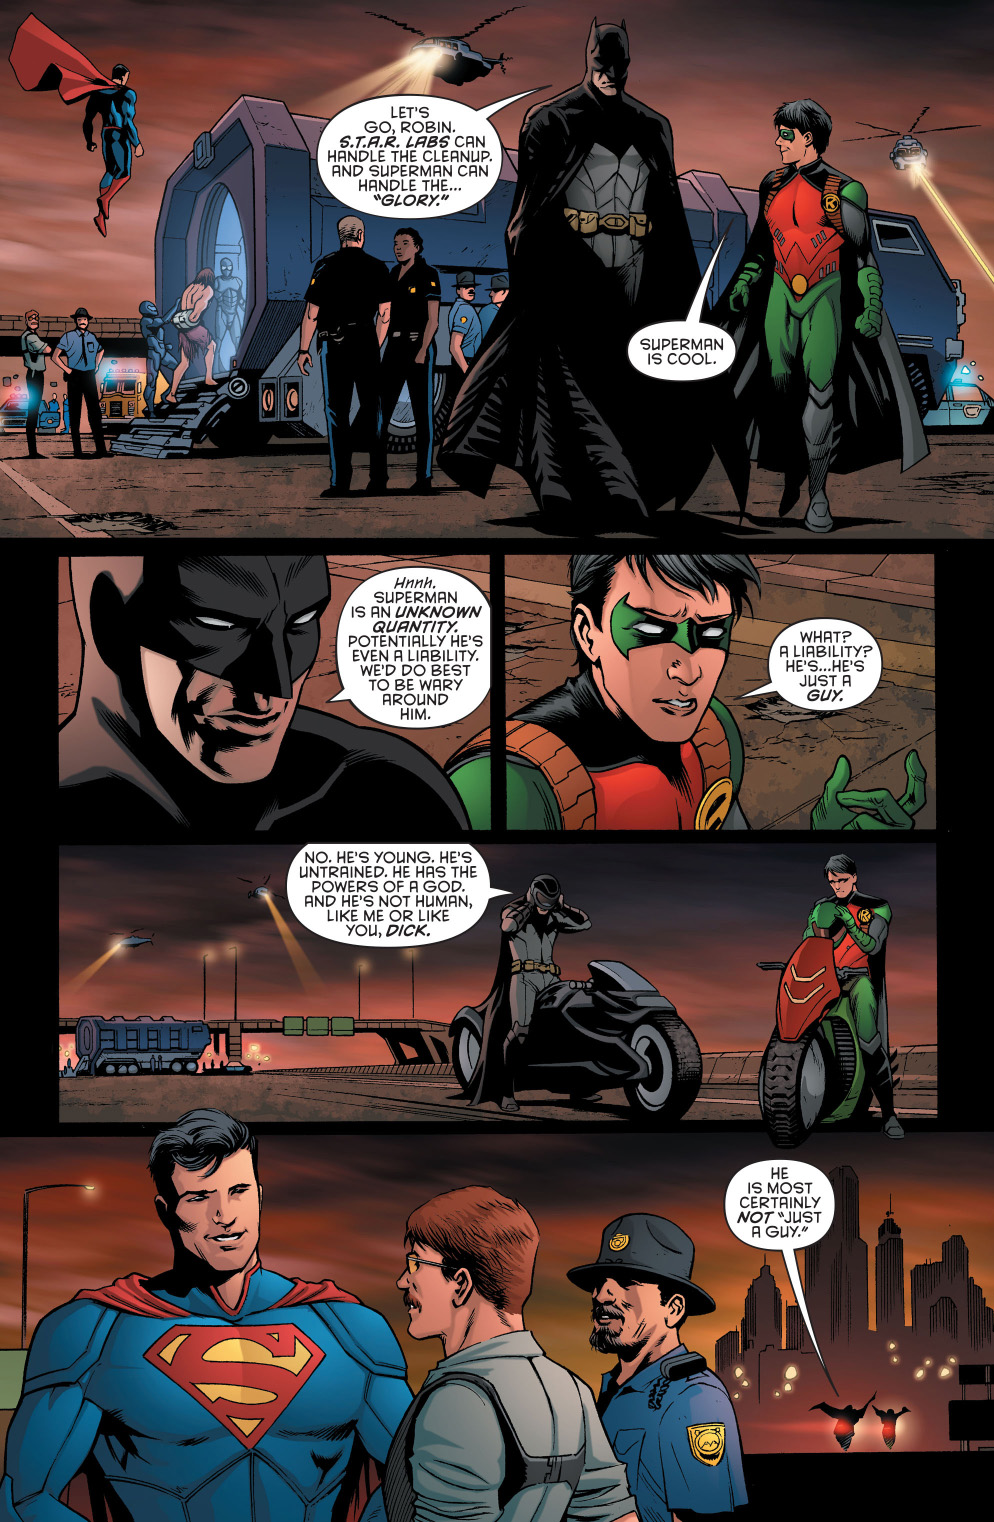 batman doesn't think superman is cool